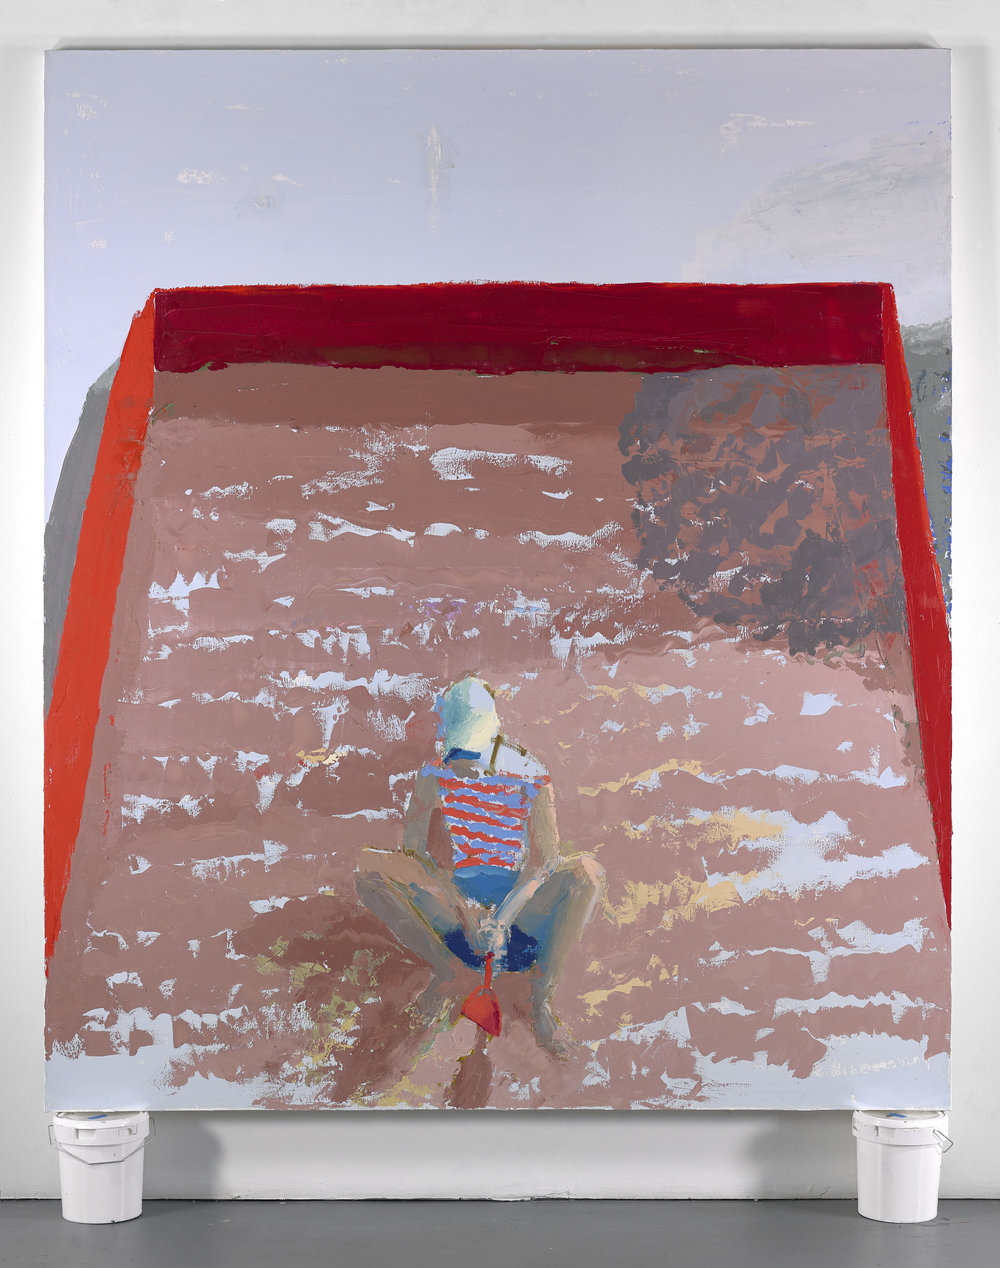 Sandbox, 7'x6', oil on canvas, 2018